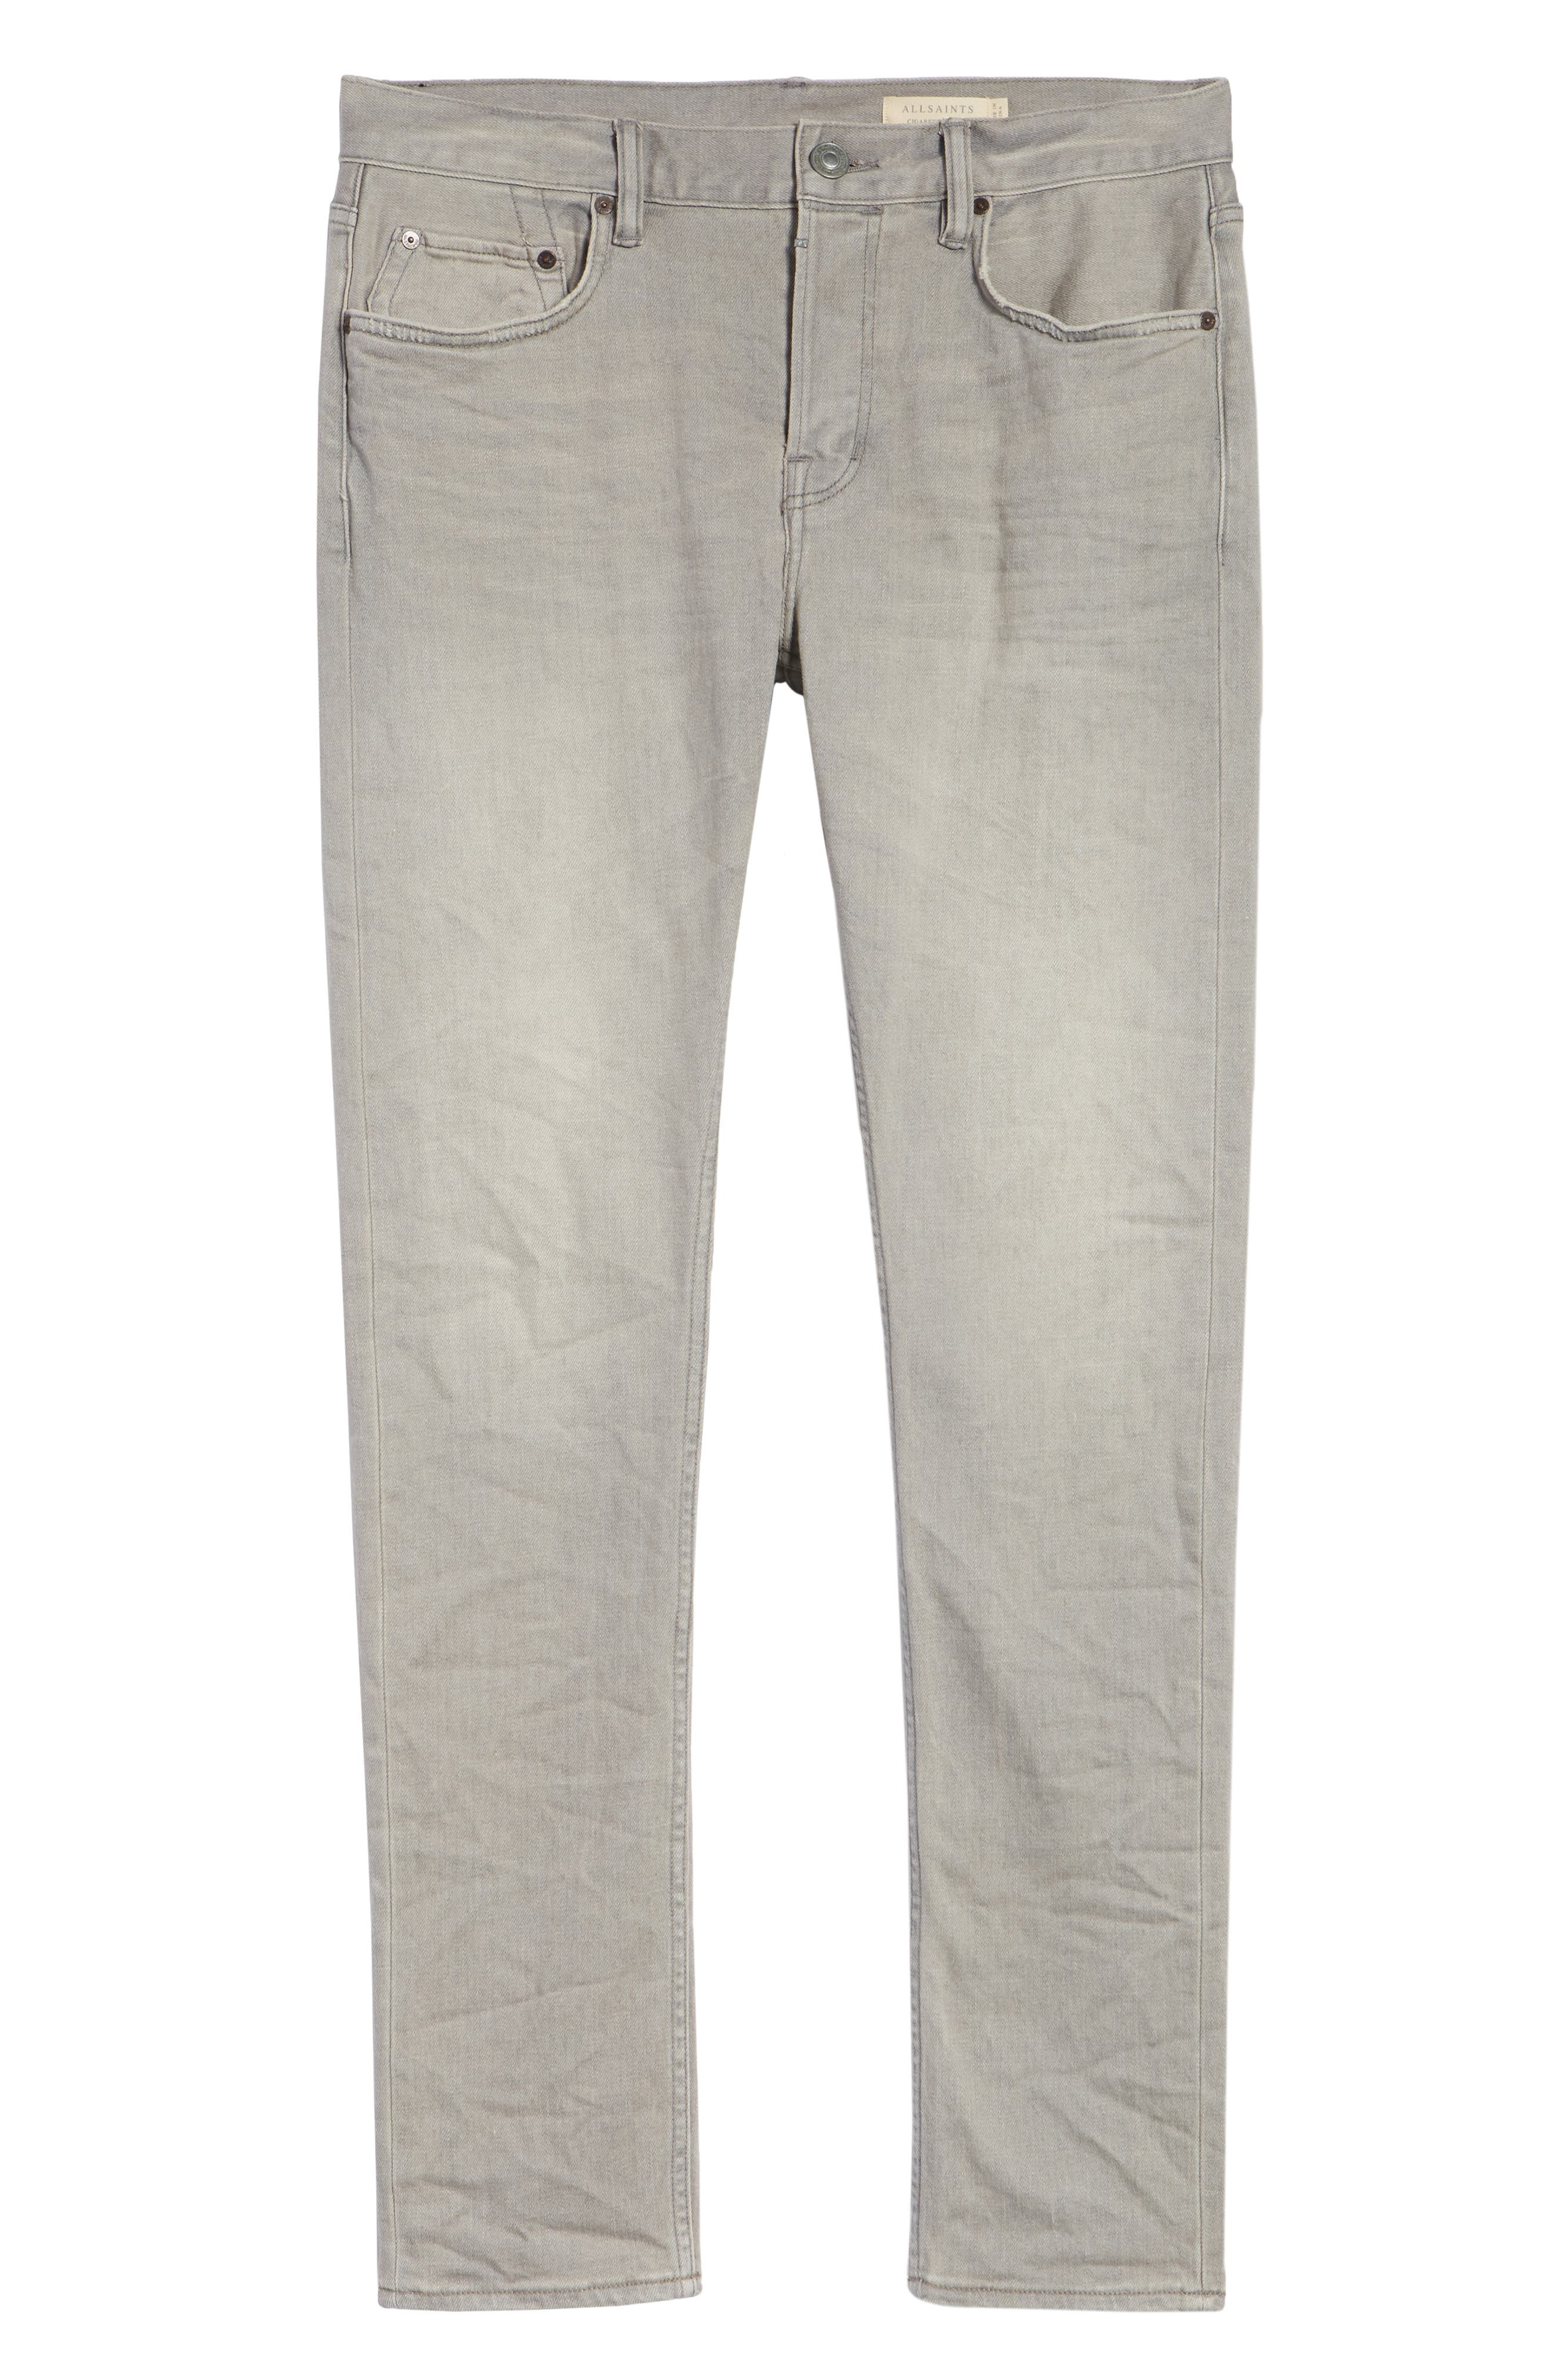 Raveline Cigarette Skinny Fit Jeans,                             Alternate thumbnail 6, color,                             GREY